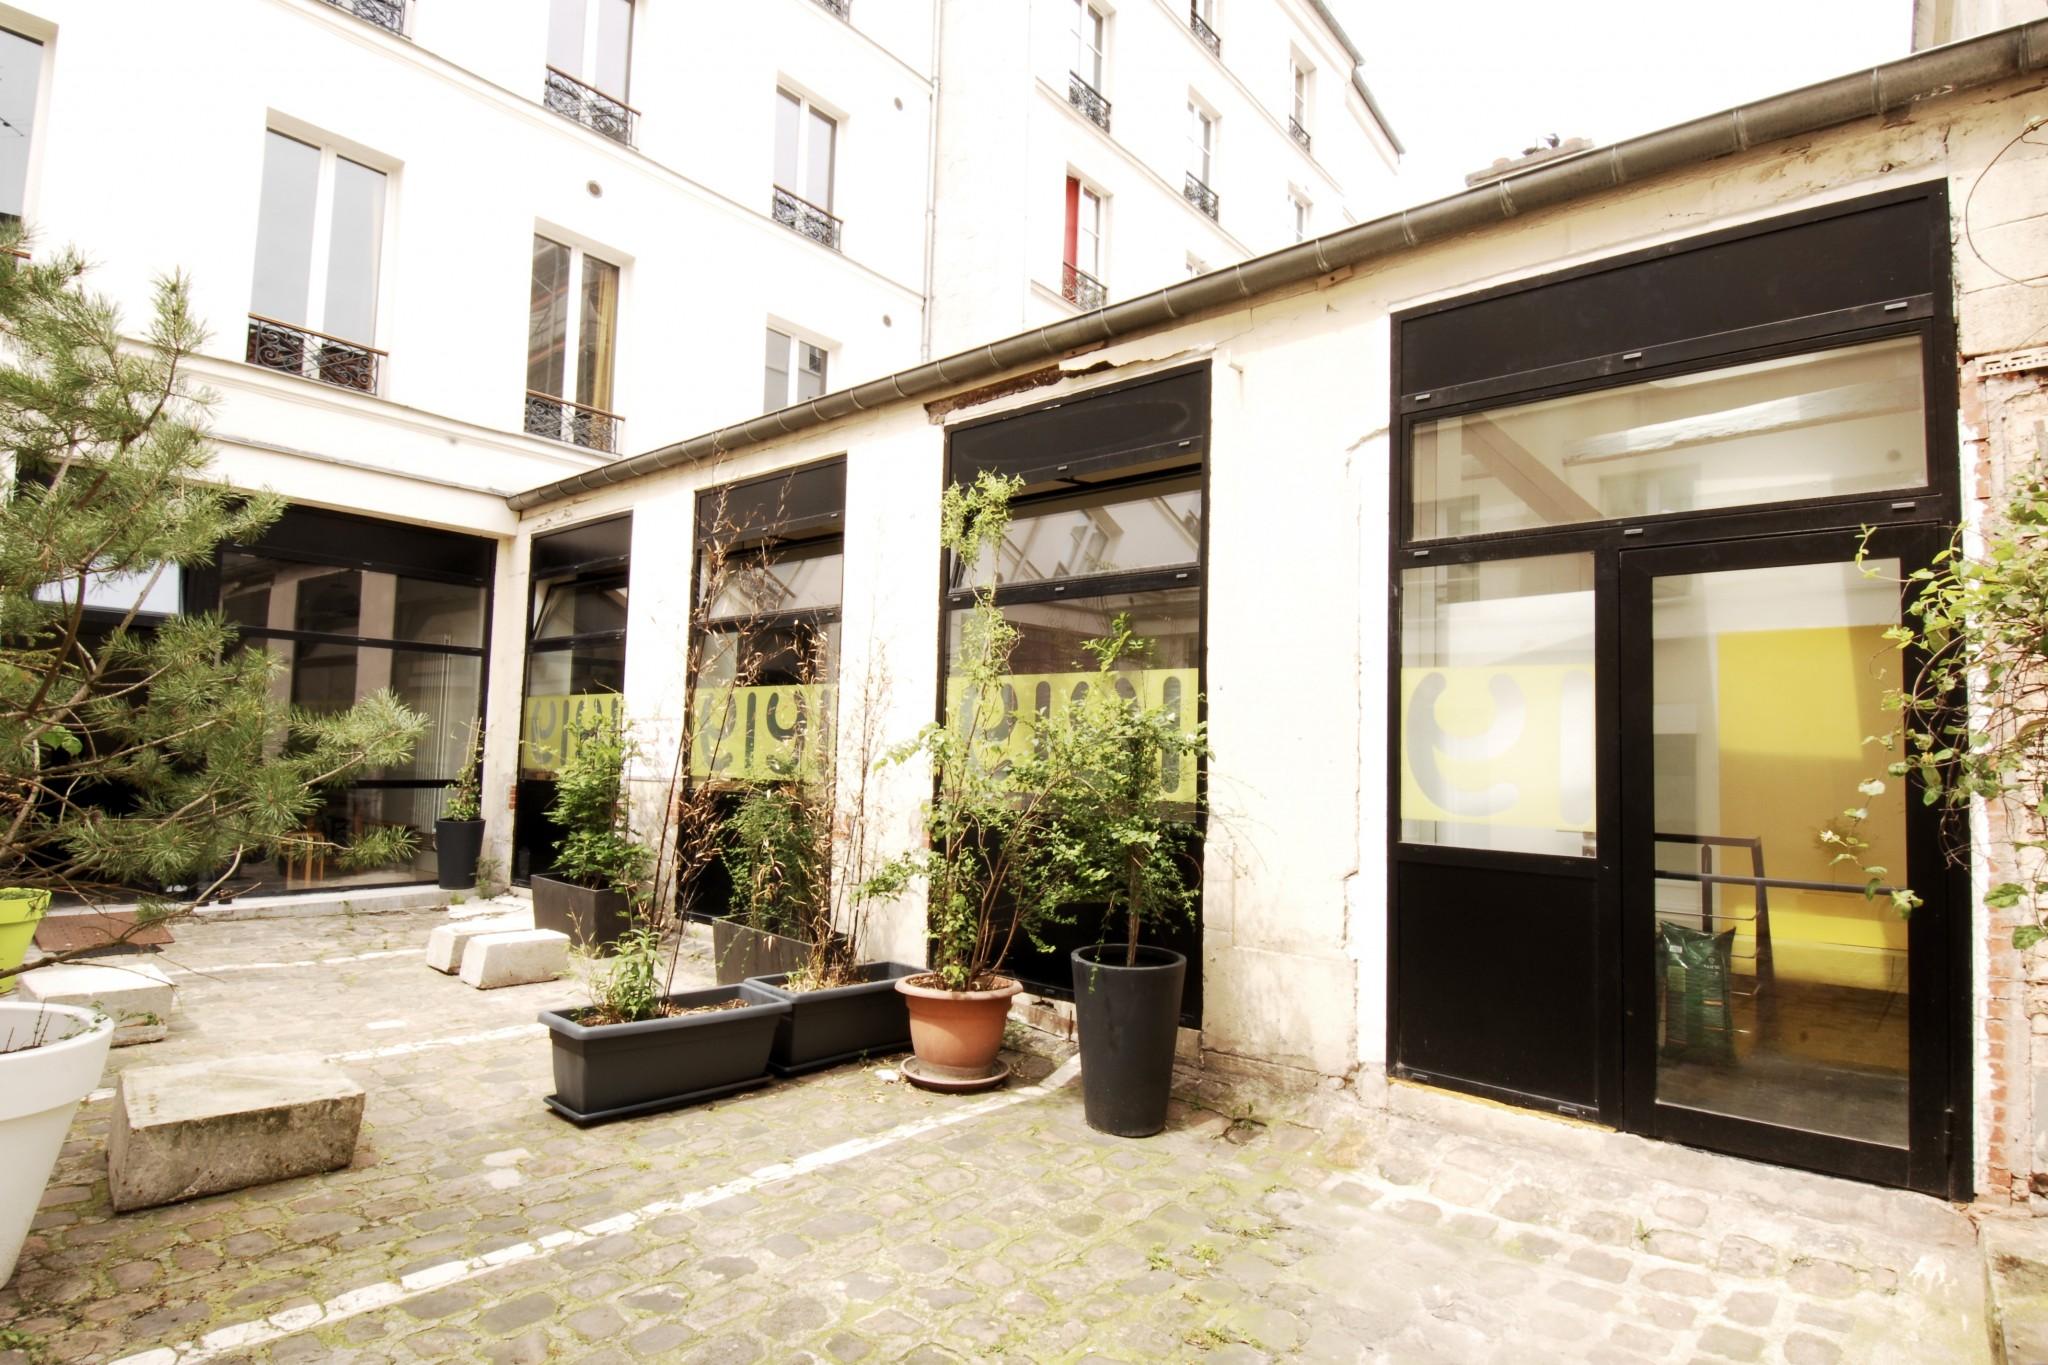 francois-garden-big-view-approach